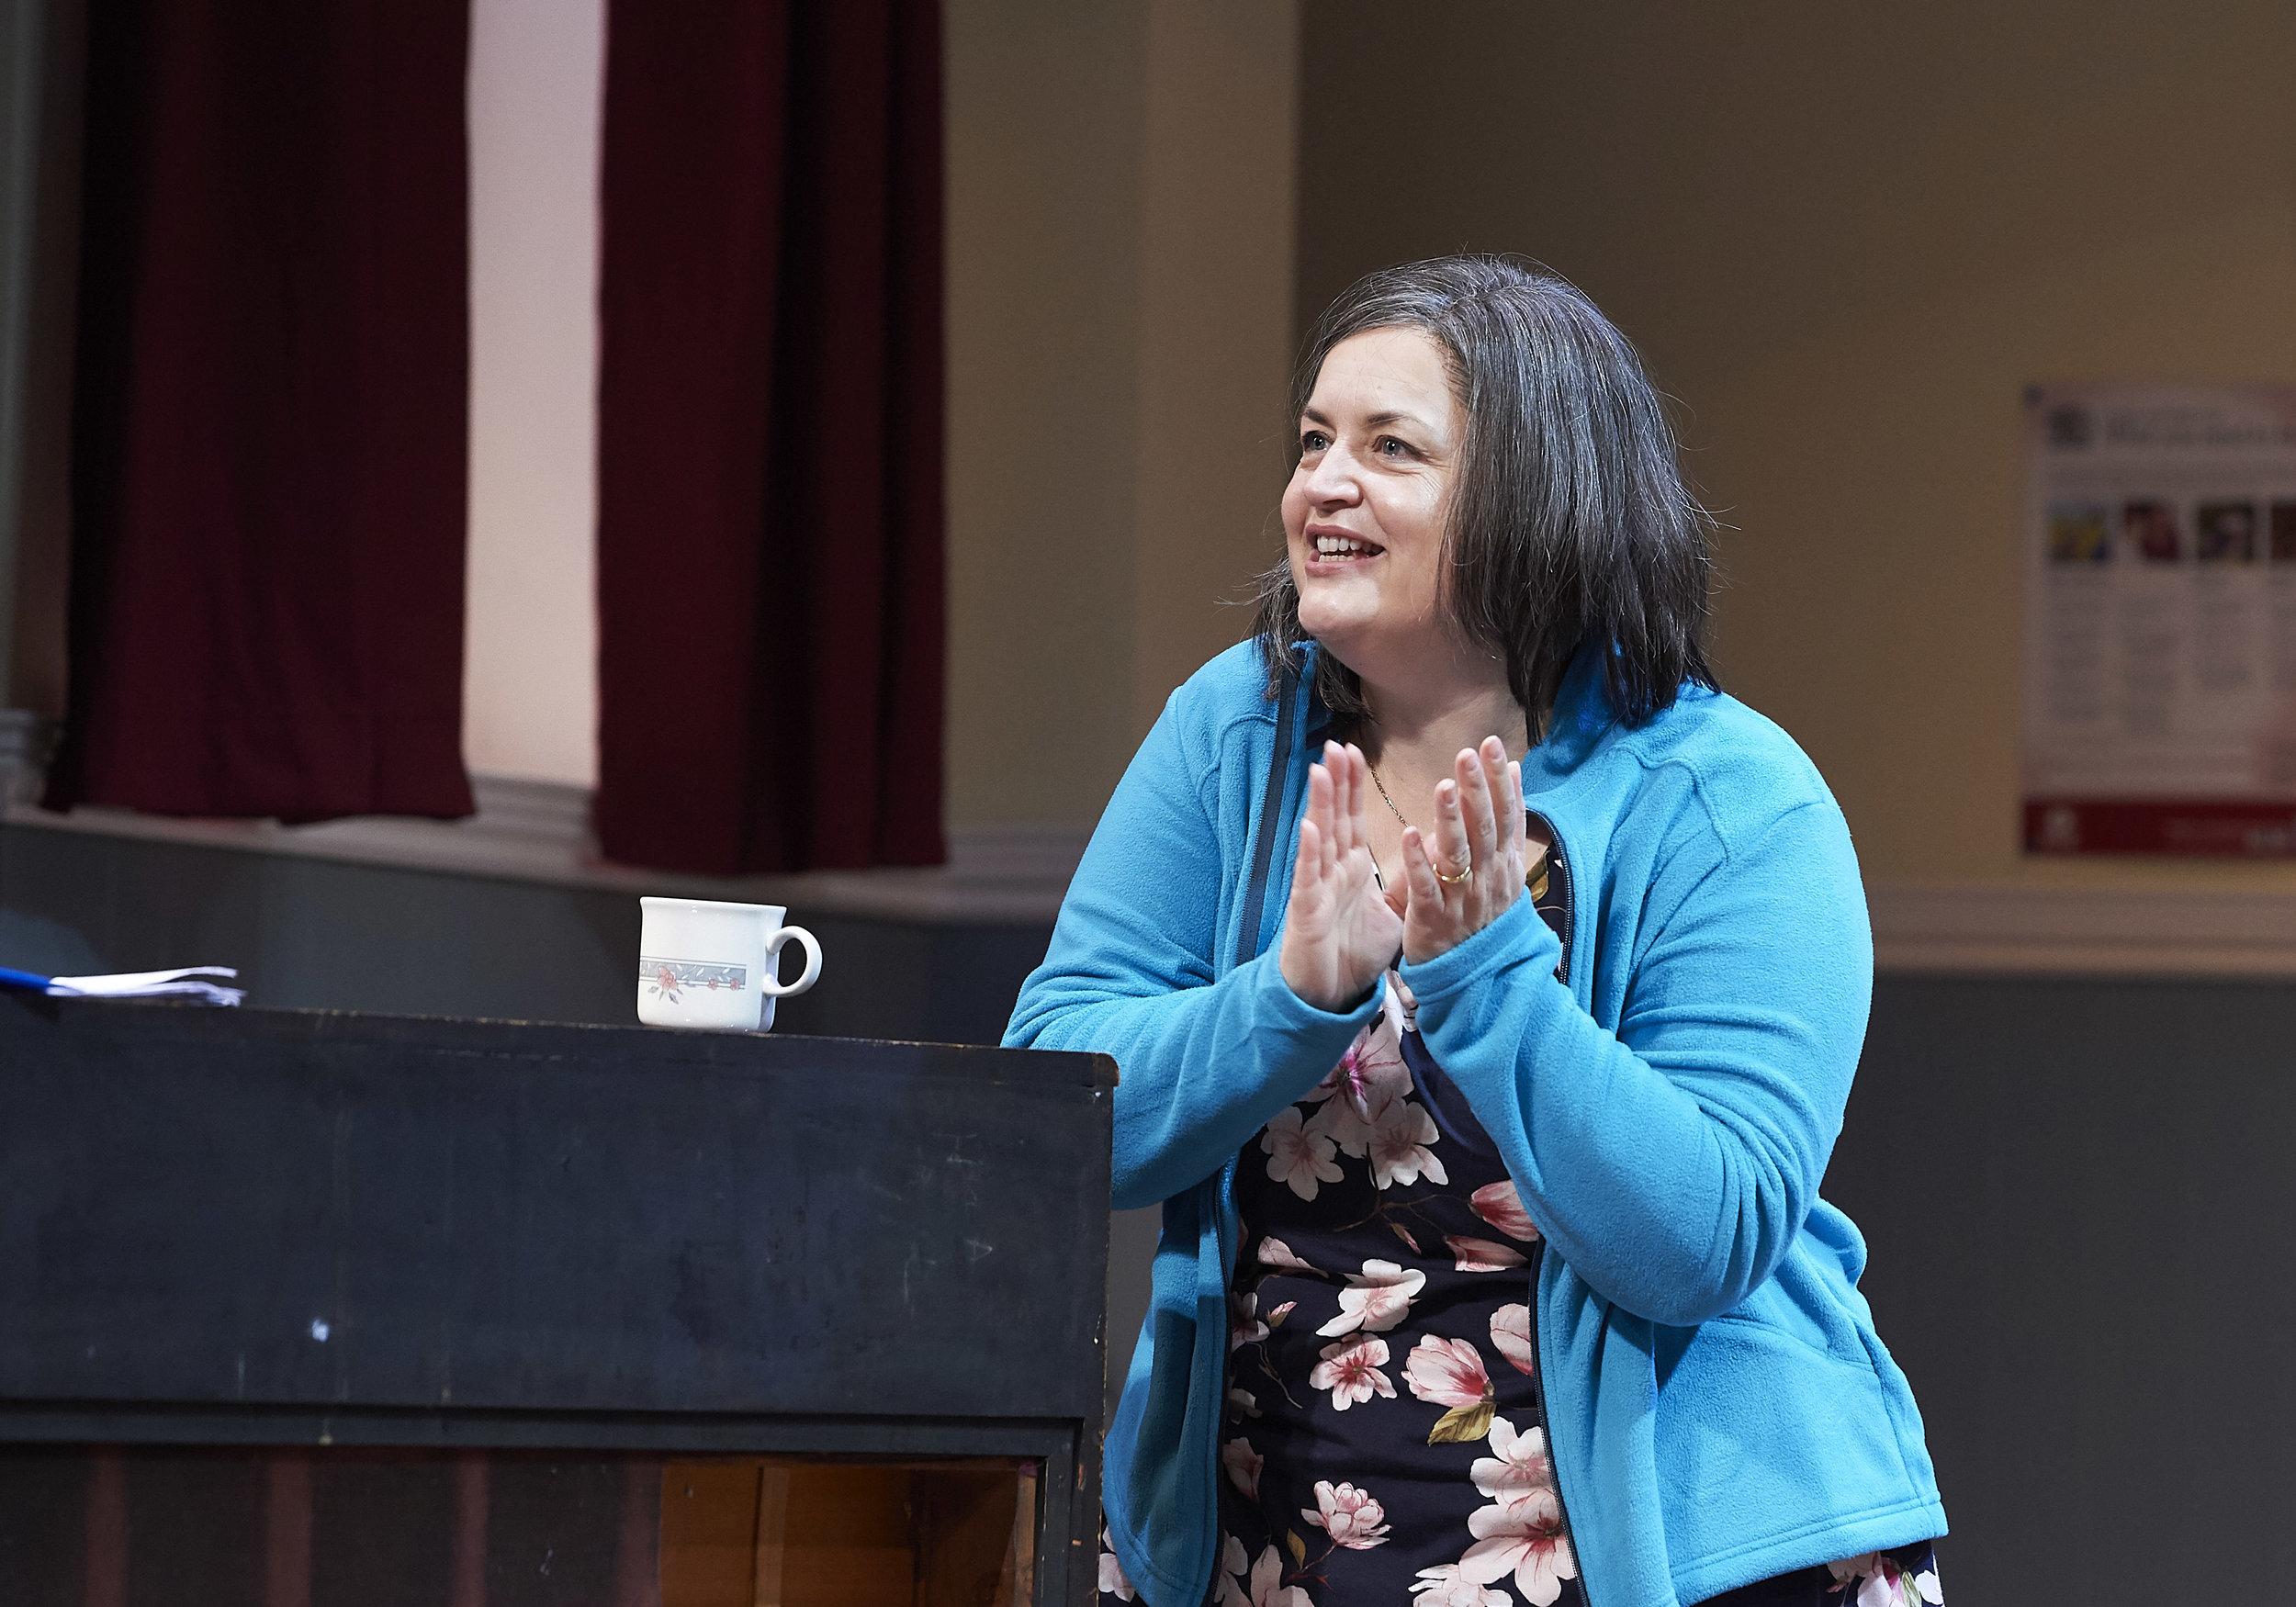 Ruth Jones at the Arts Theatre Cambridge in 'The Nightingales' through Saturday 17th November